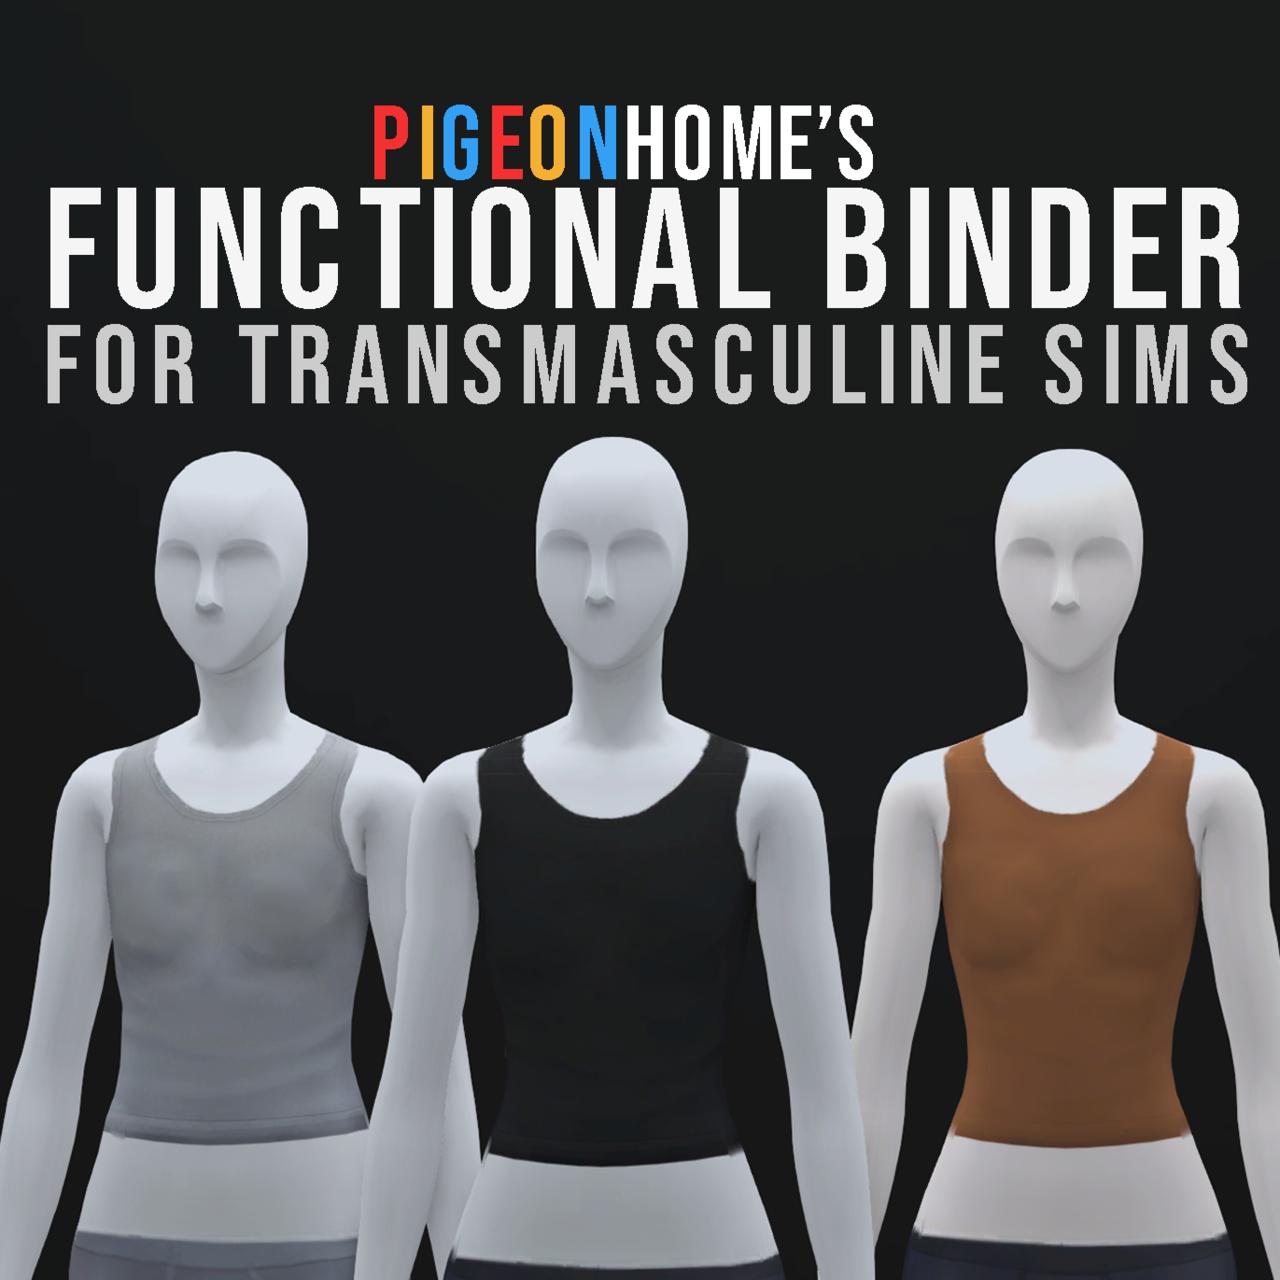 Pigeonhome: Functional Binder By